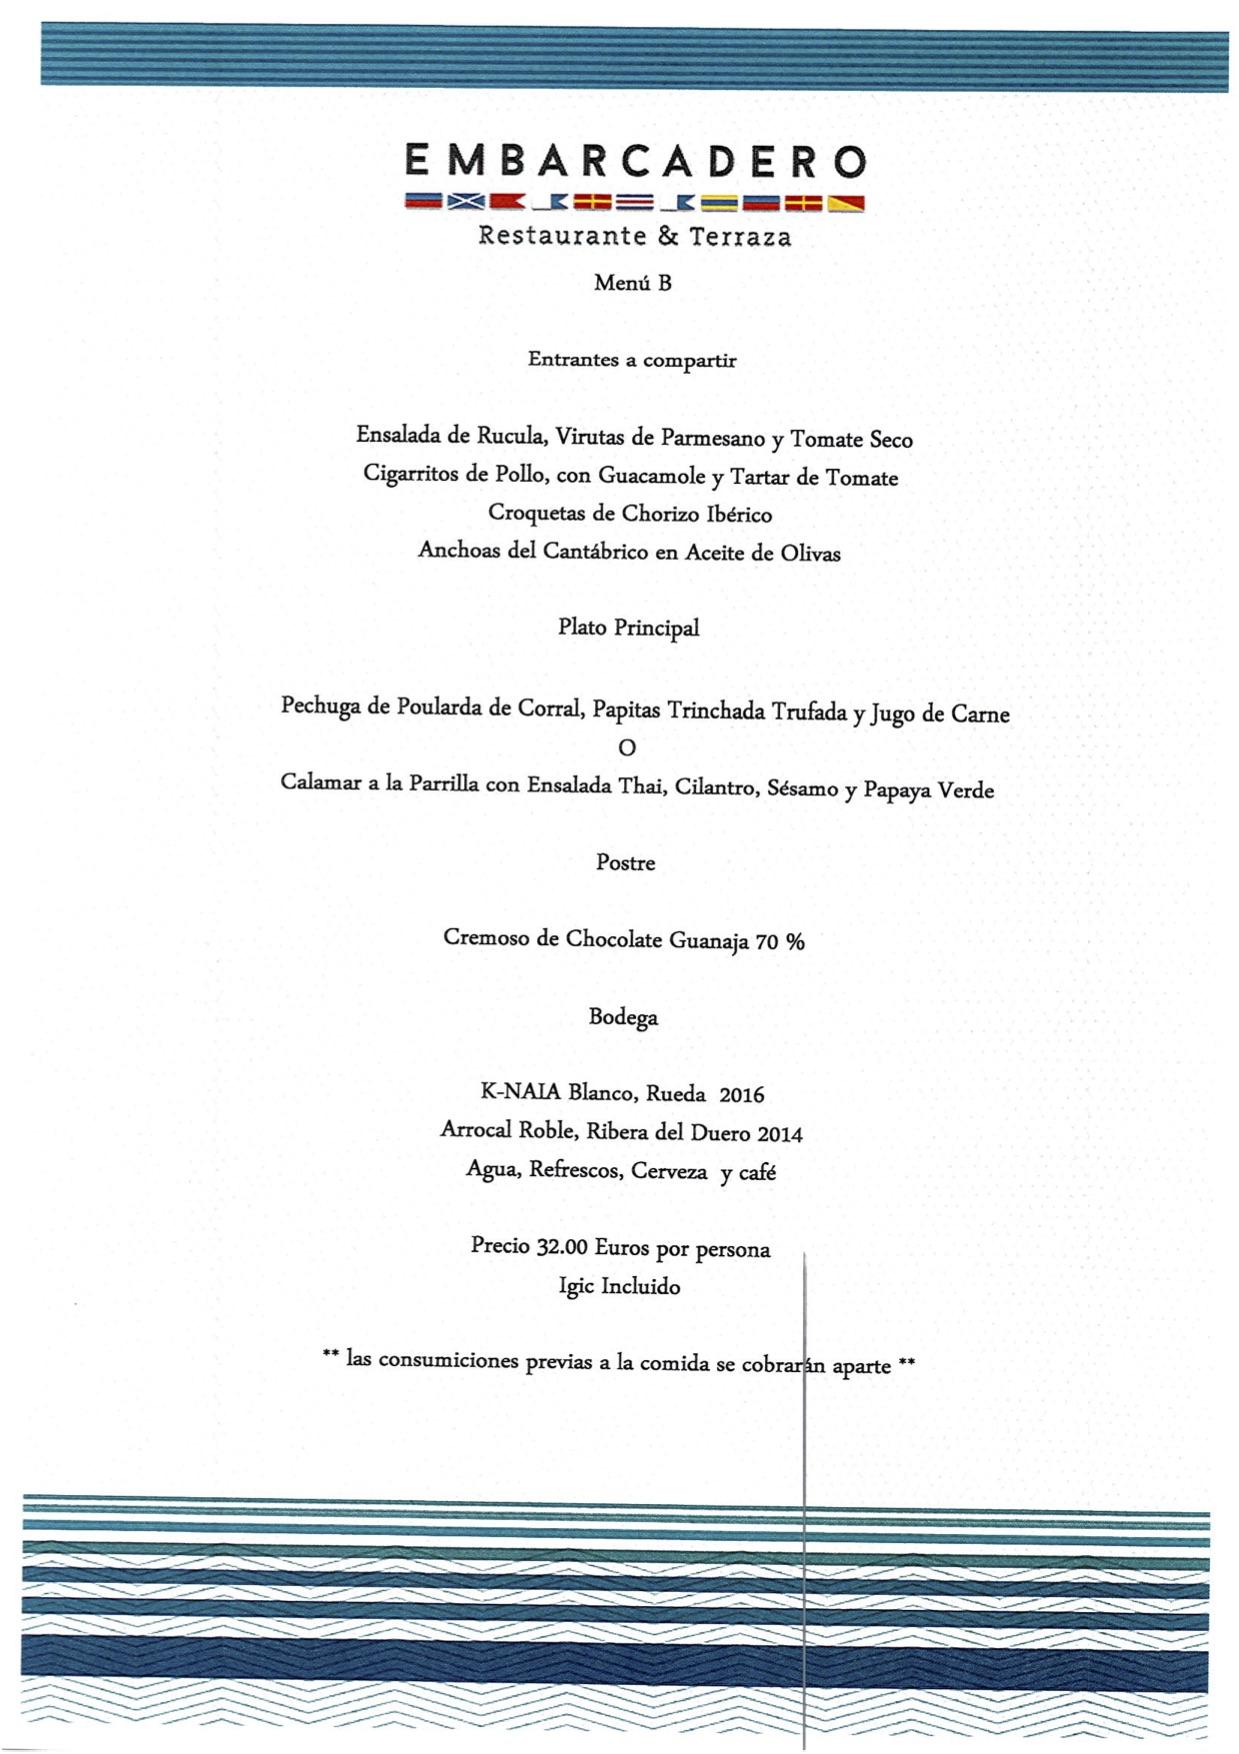 embarcadero-eventos-menu-b